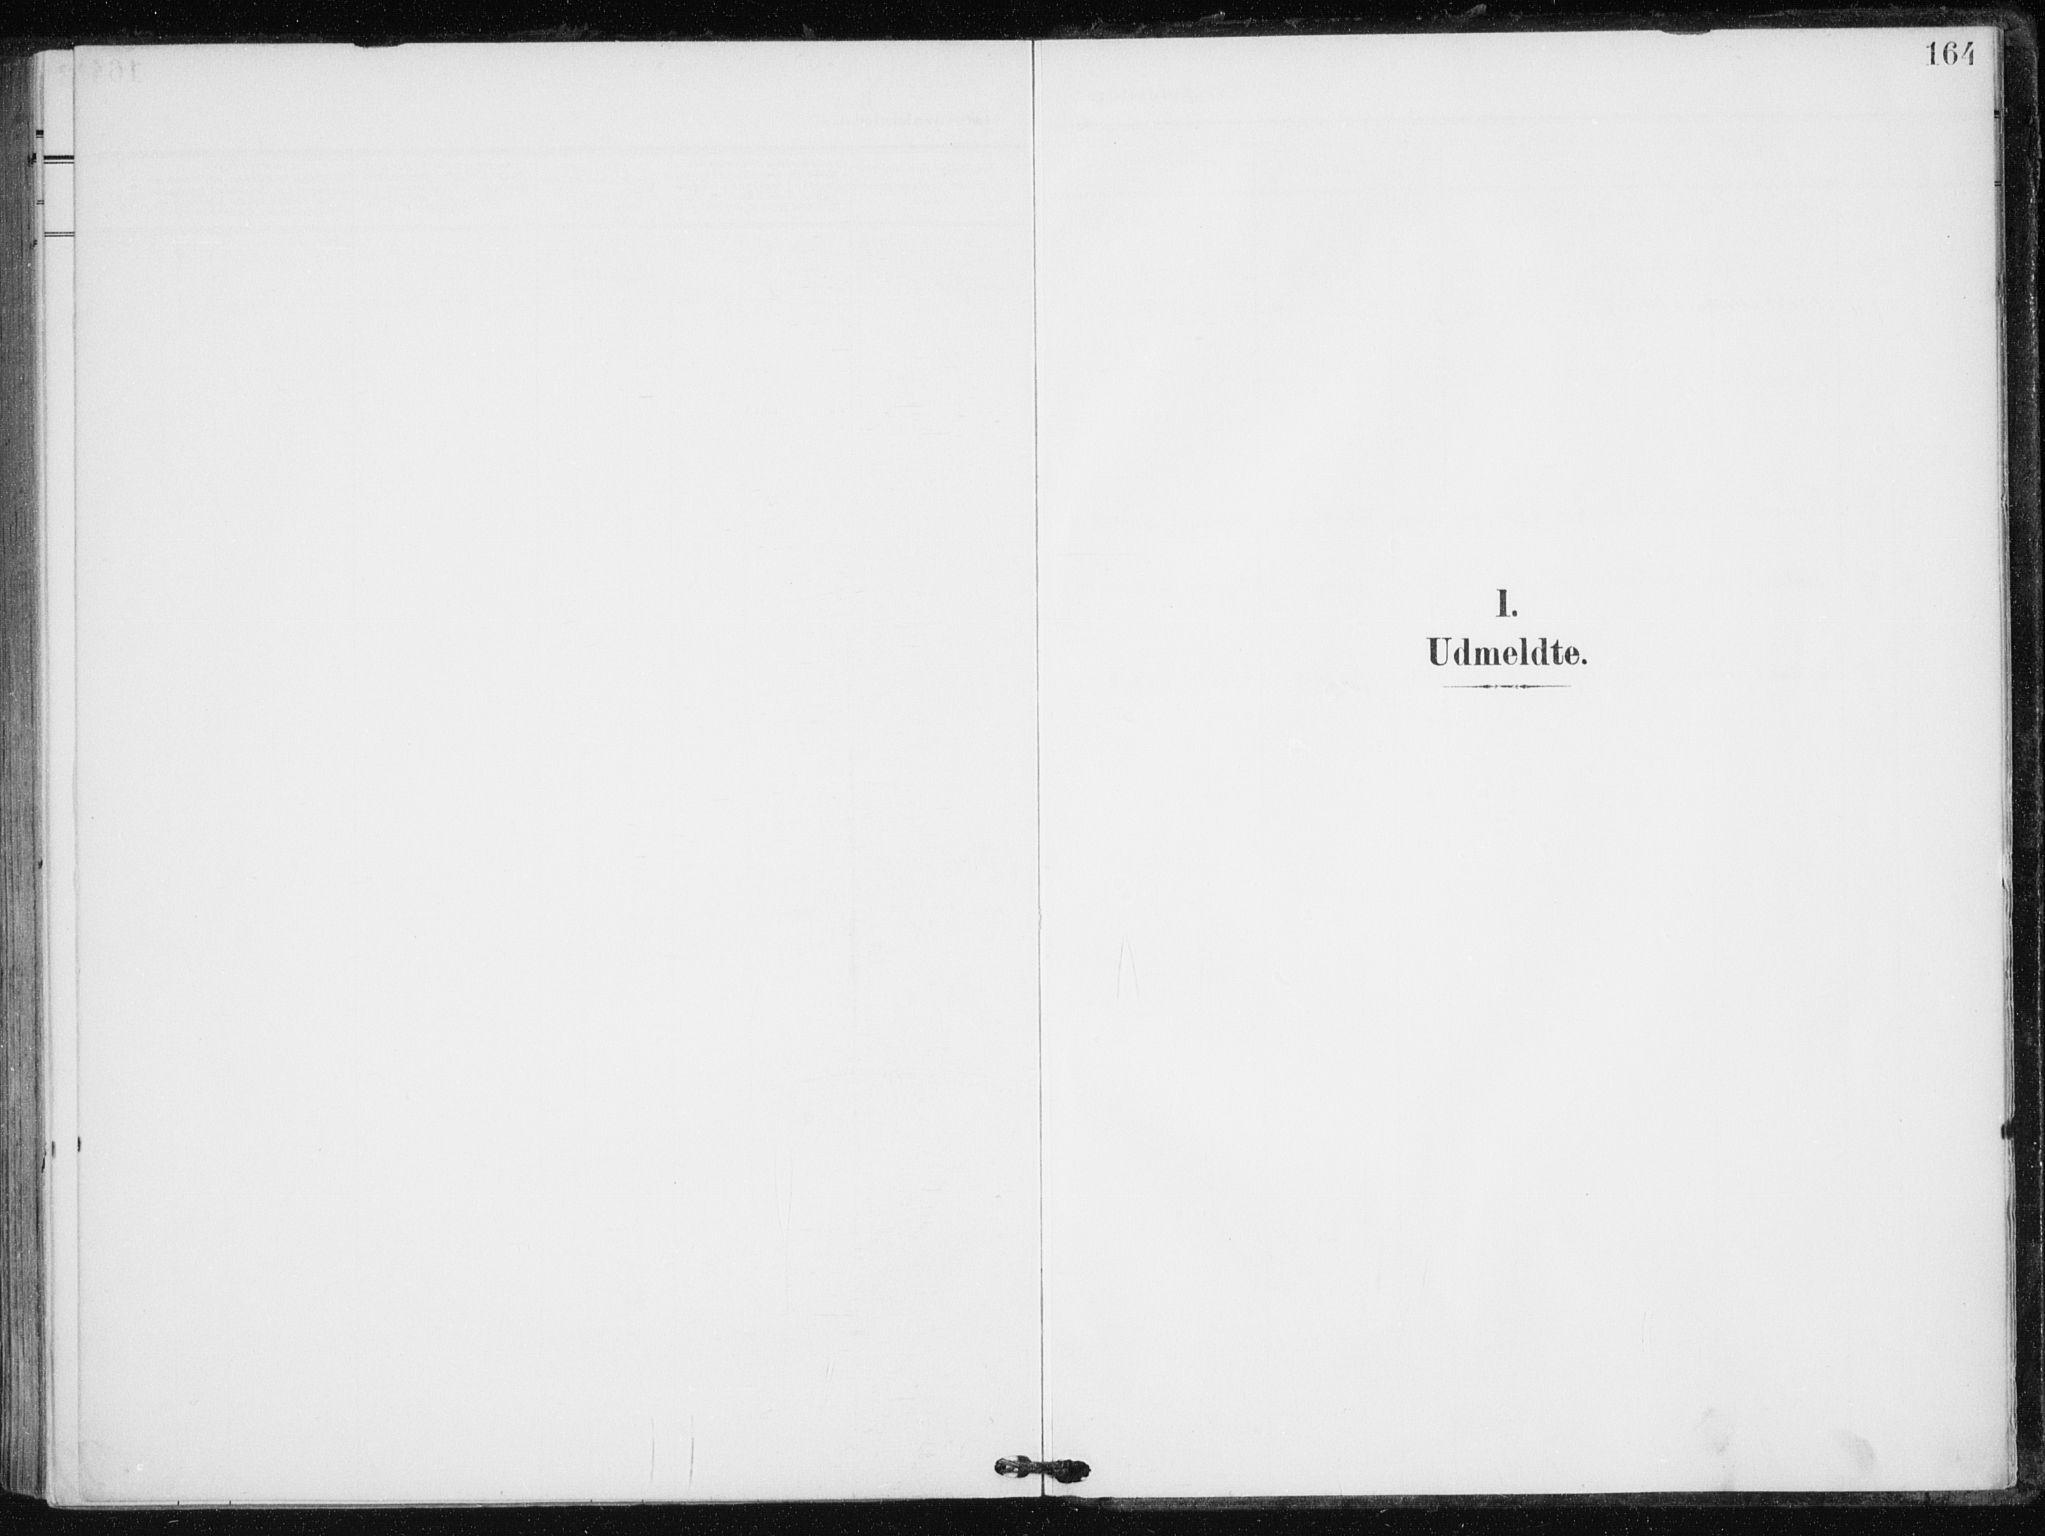 SATØ, Tranøy sokneprestkontor, I/Ia/Iaa/L0013kirke: Ministerialbok nr. 13, 1905-1922, s. 164